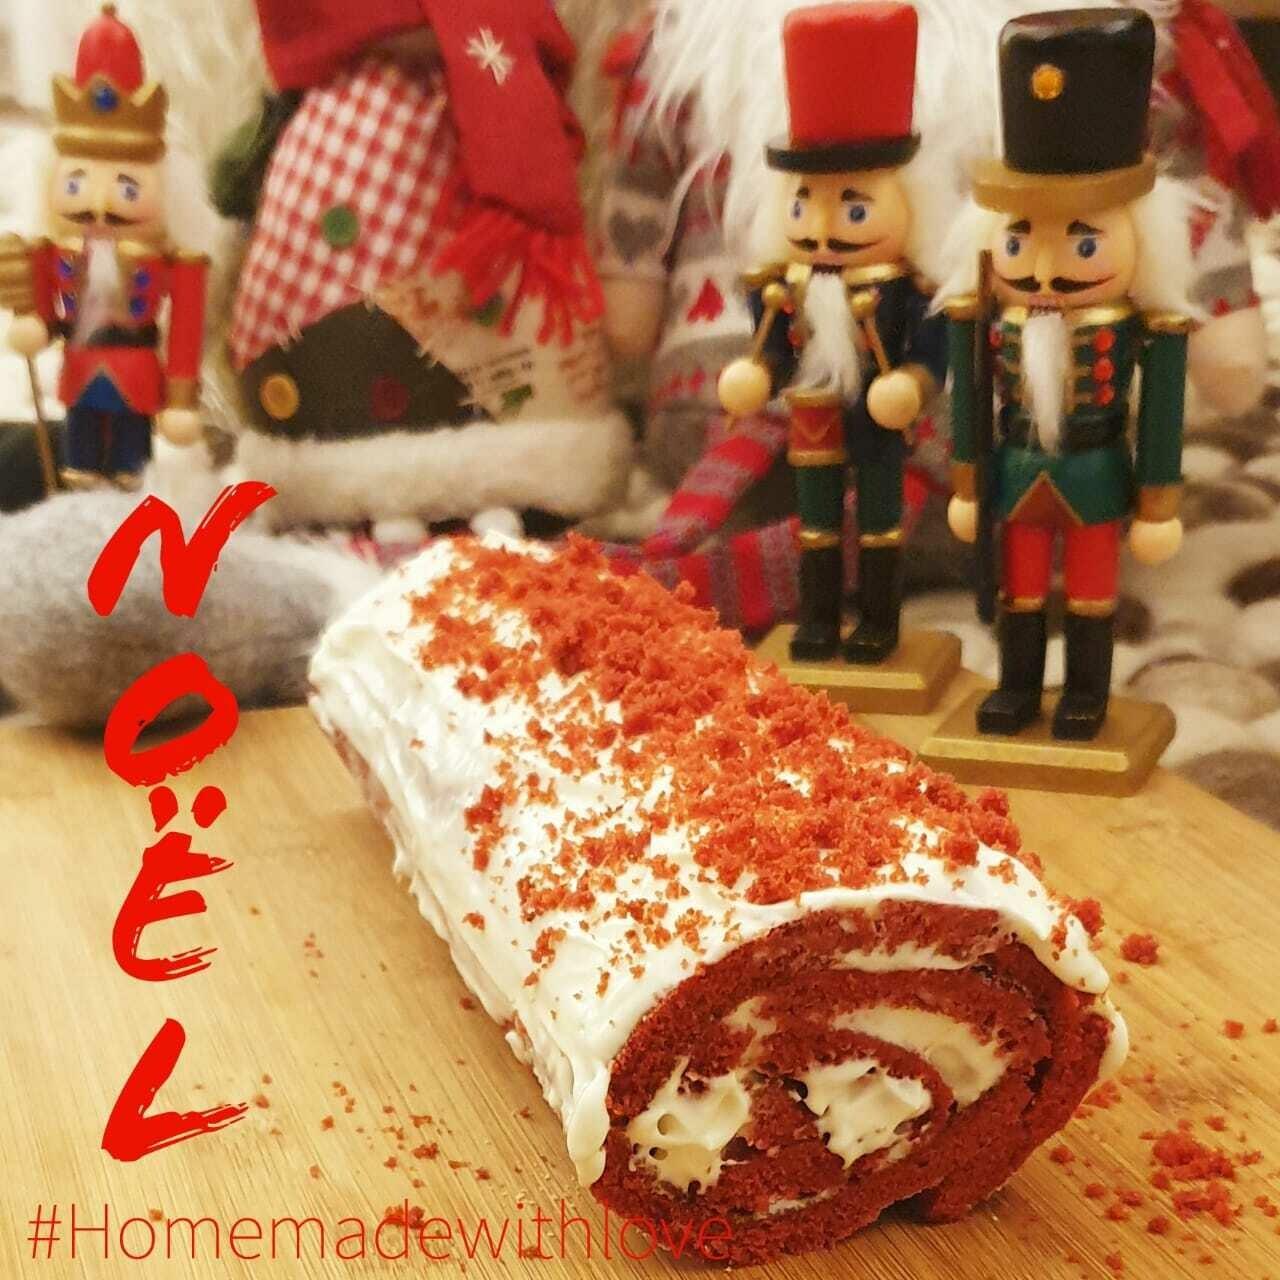 Buche de Noel Red Velvet (Piece) - Bon Appetit